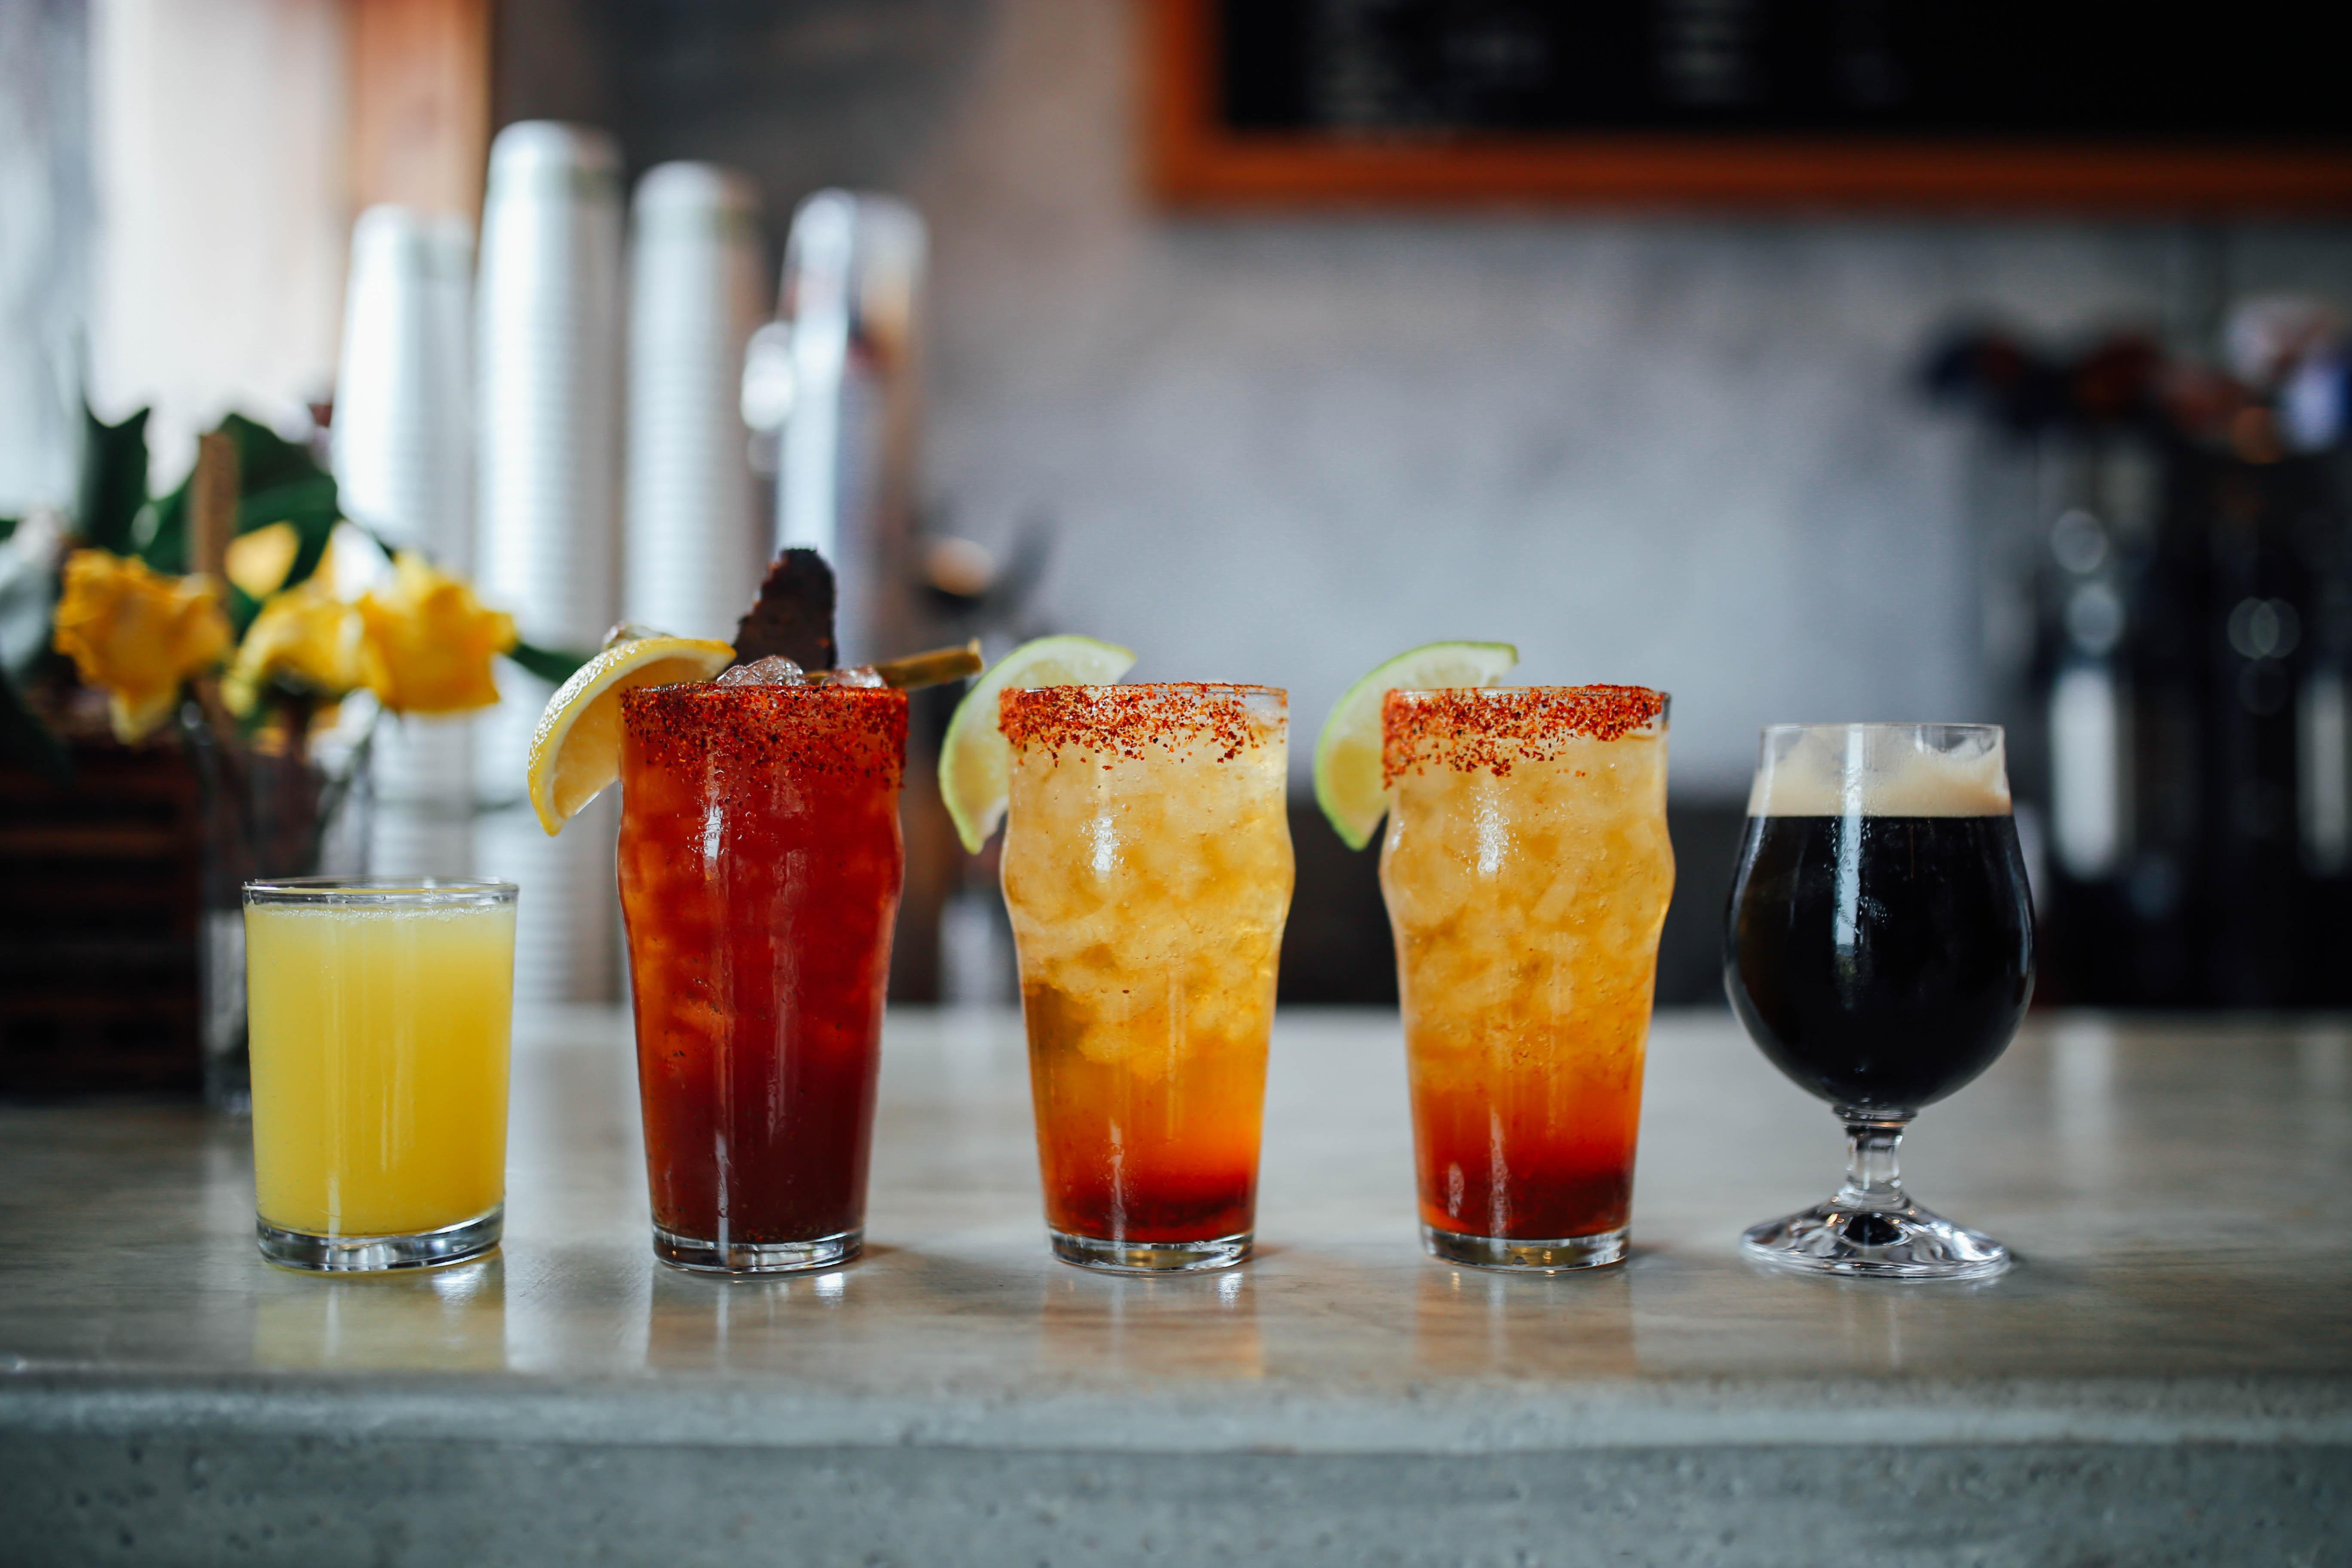 Cosmic Coffee's brunch cocktails